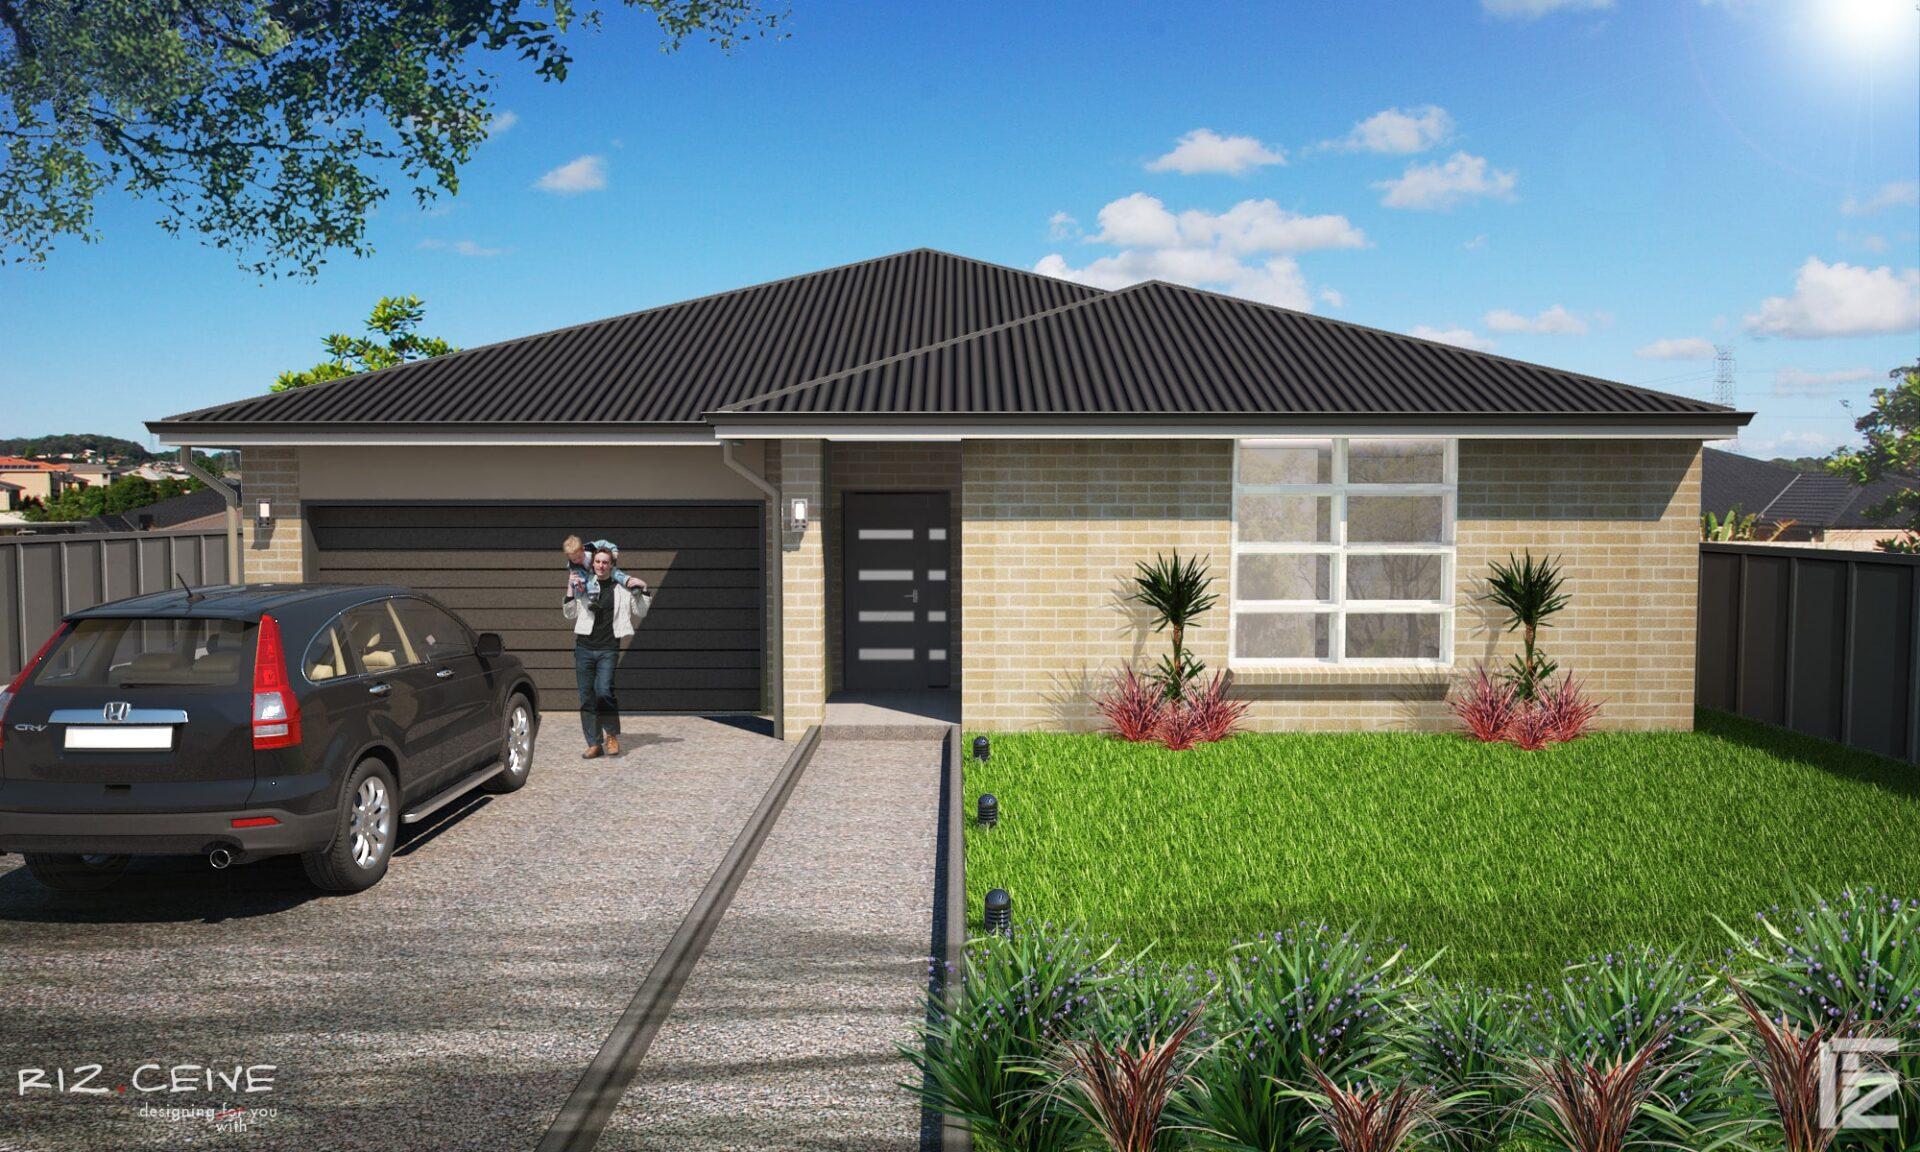 craighill house design